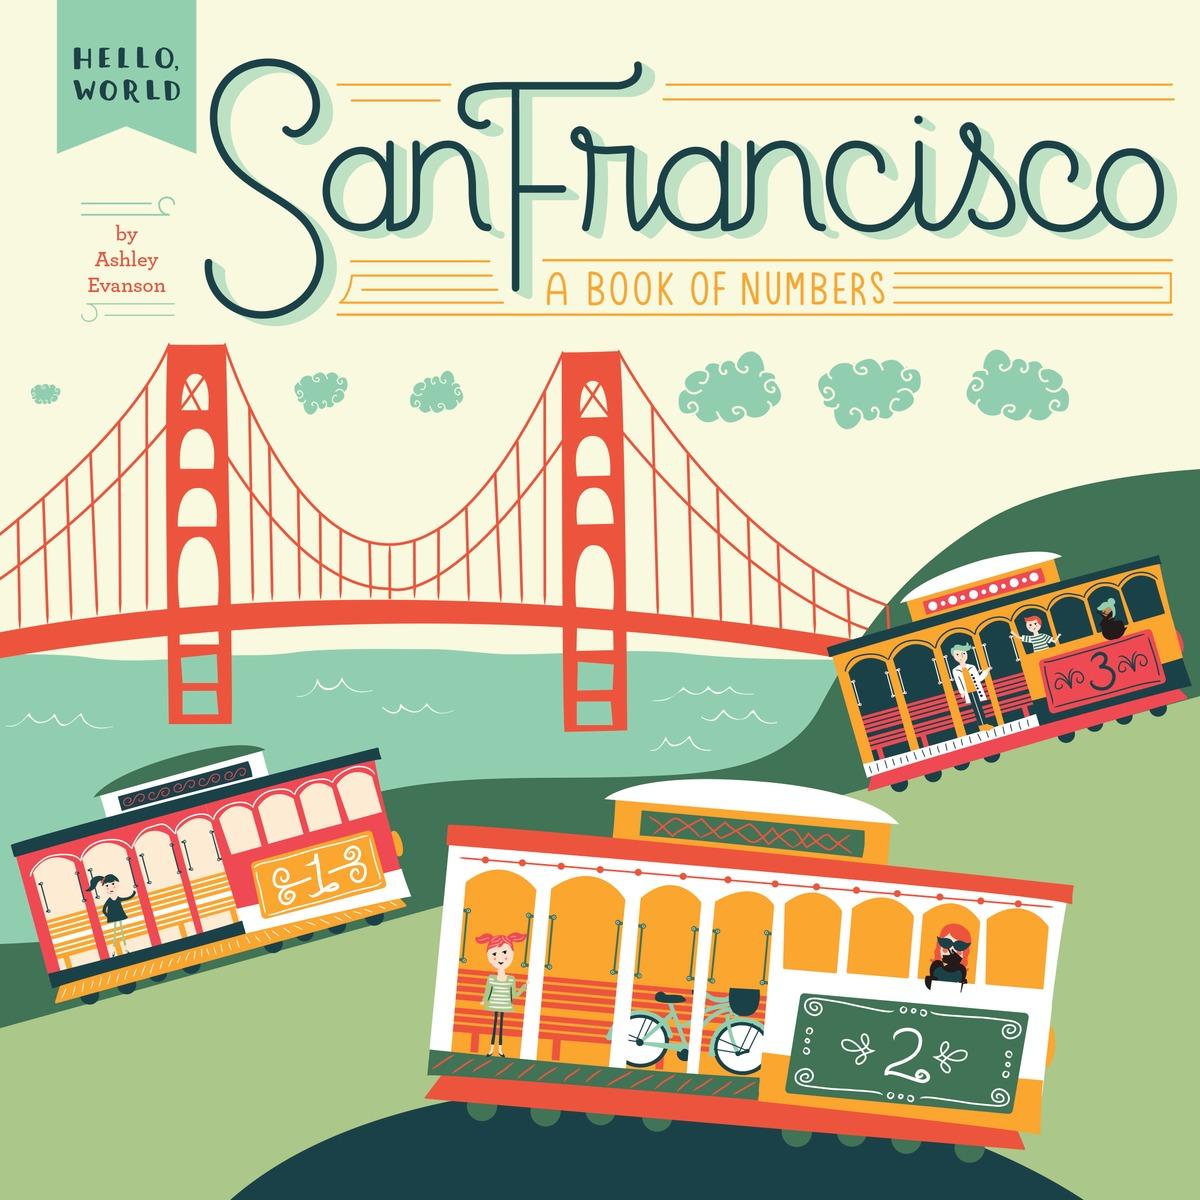 EVANSON, ASHLEY. HELLO, WORLD: SAN FRANCISCO